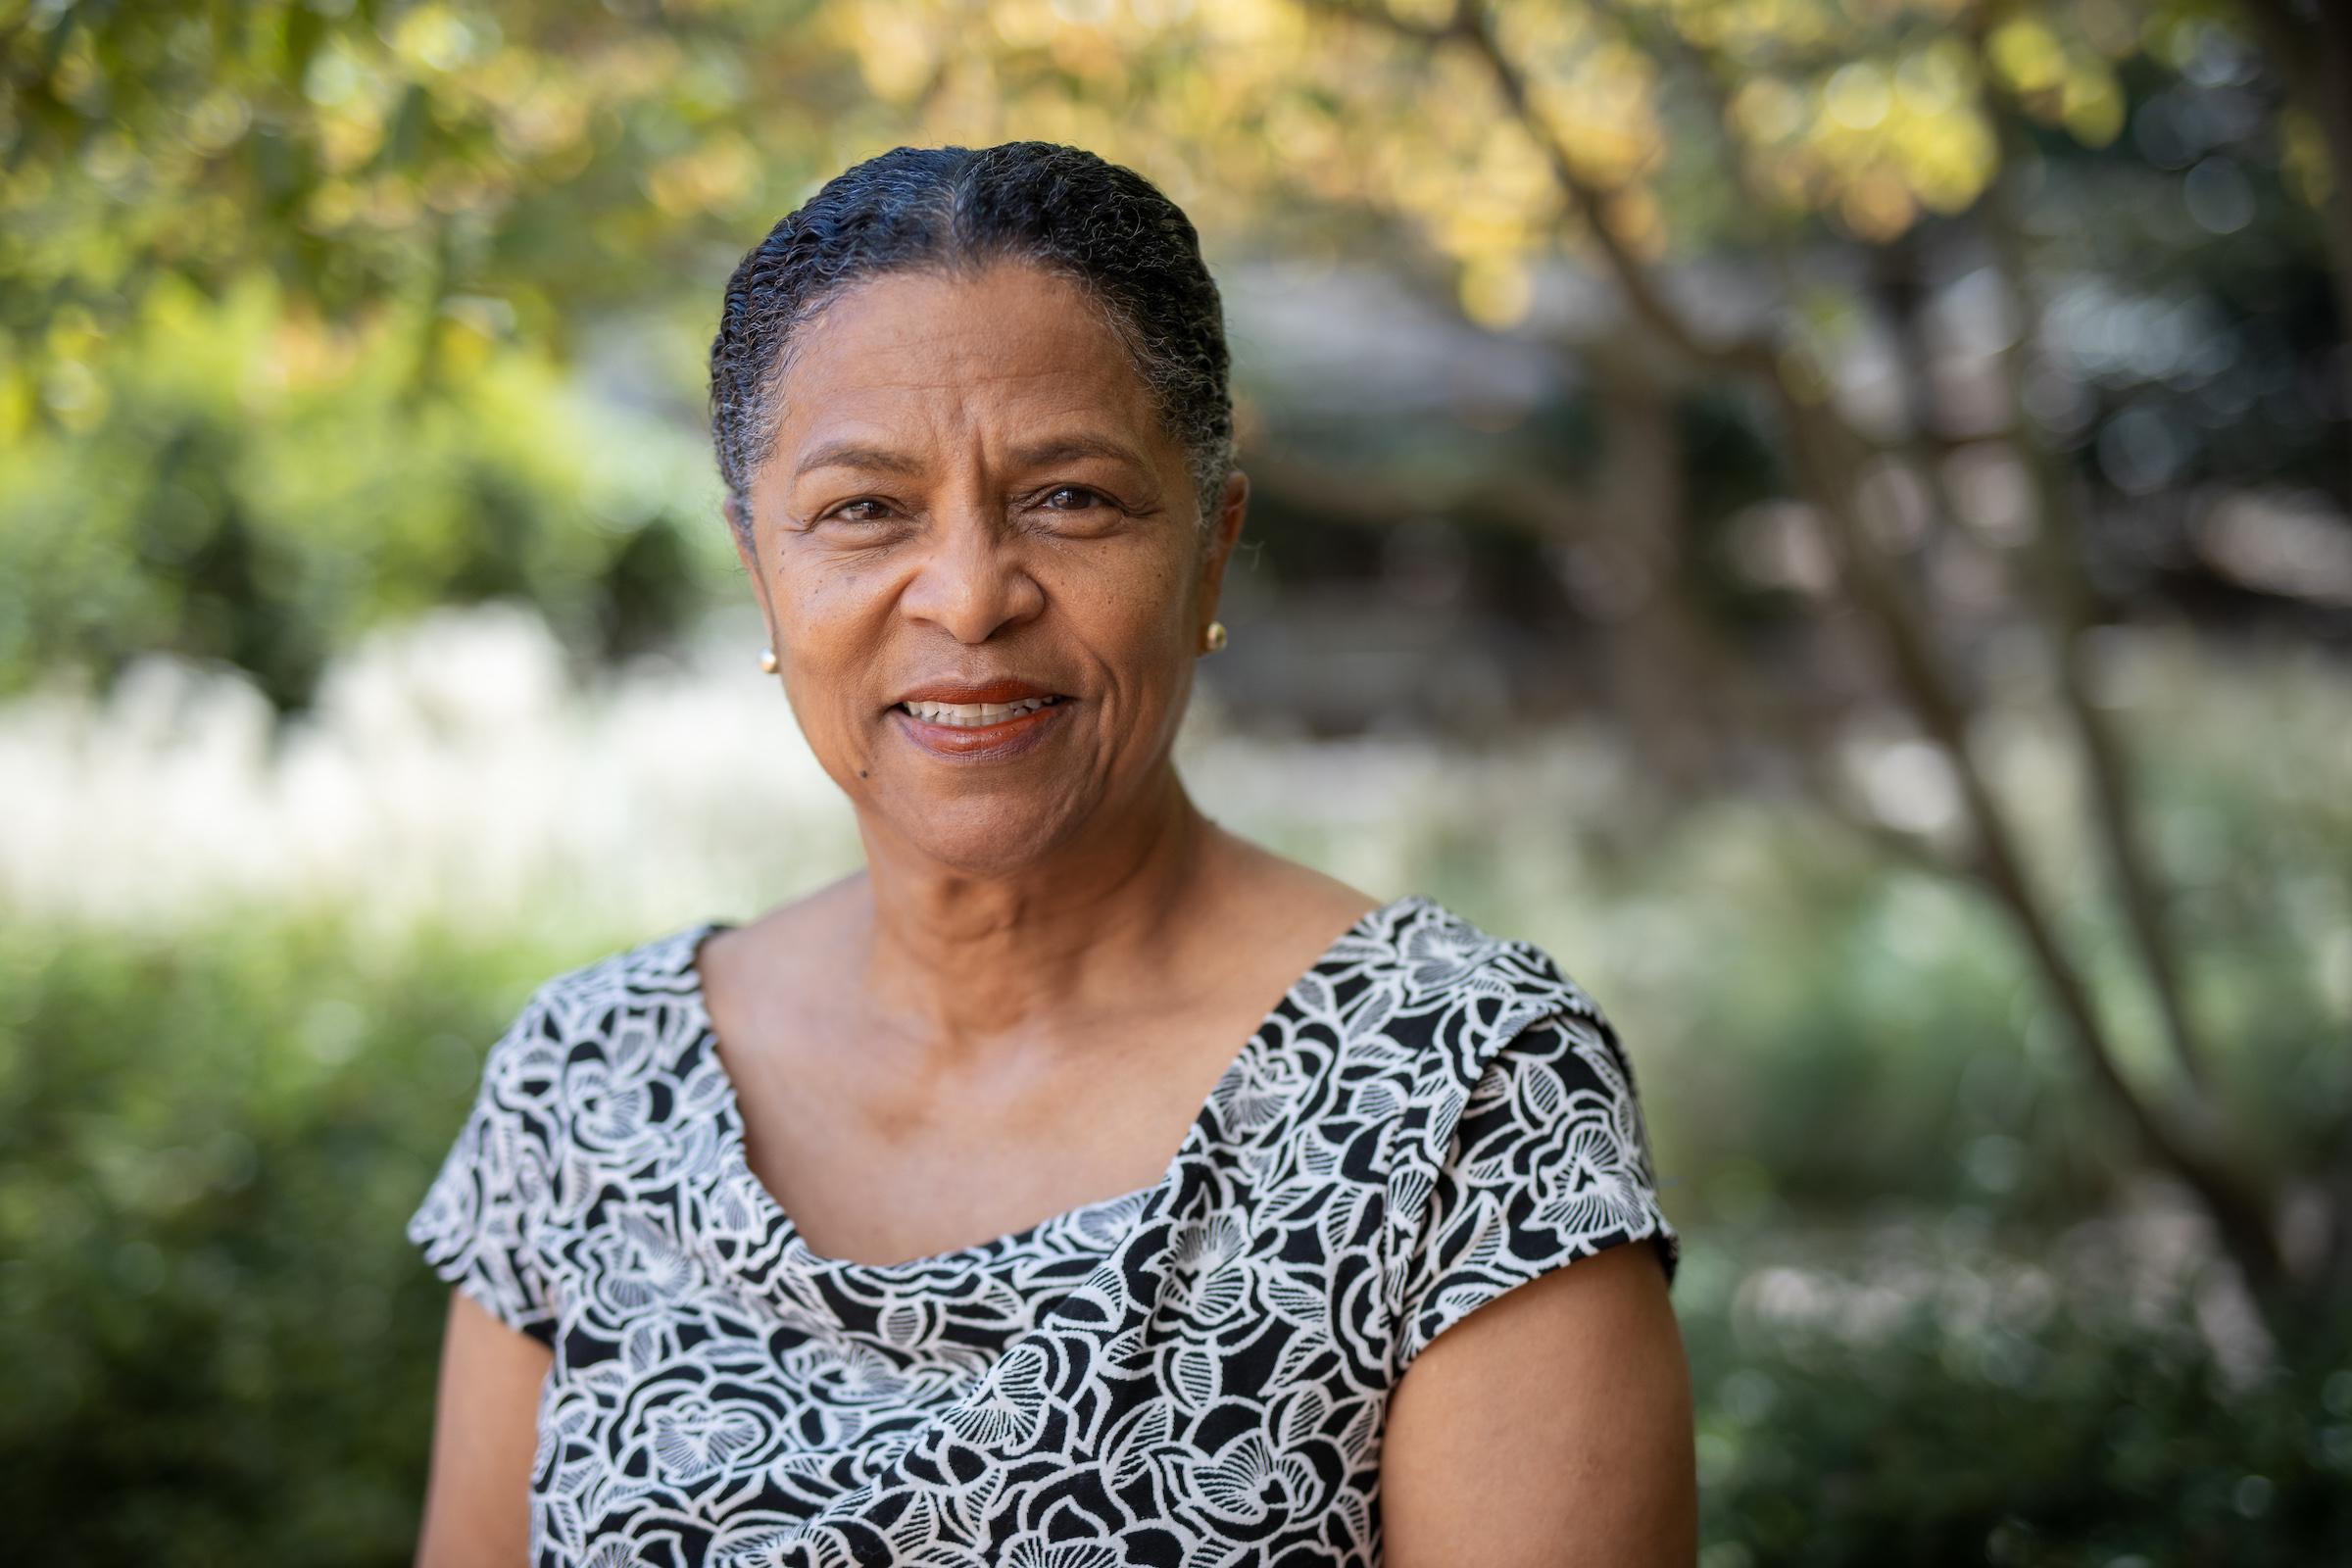 Headshot of Marian Johnson-Thompson